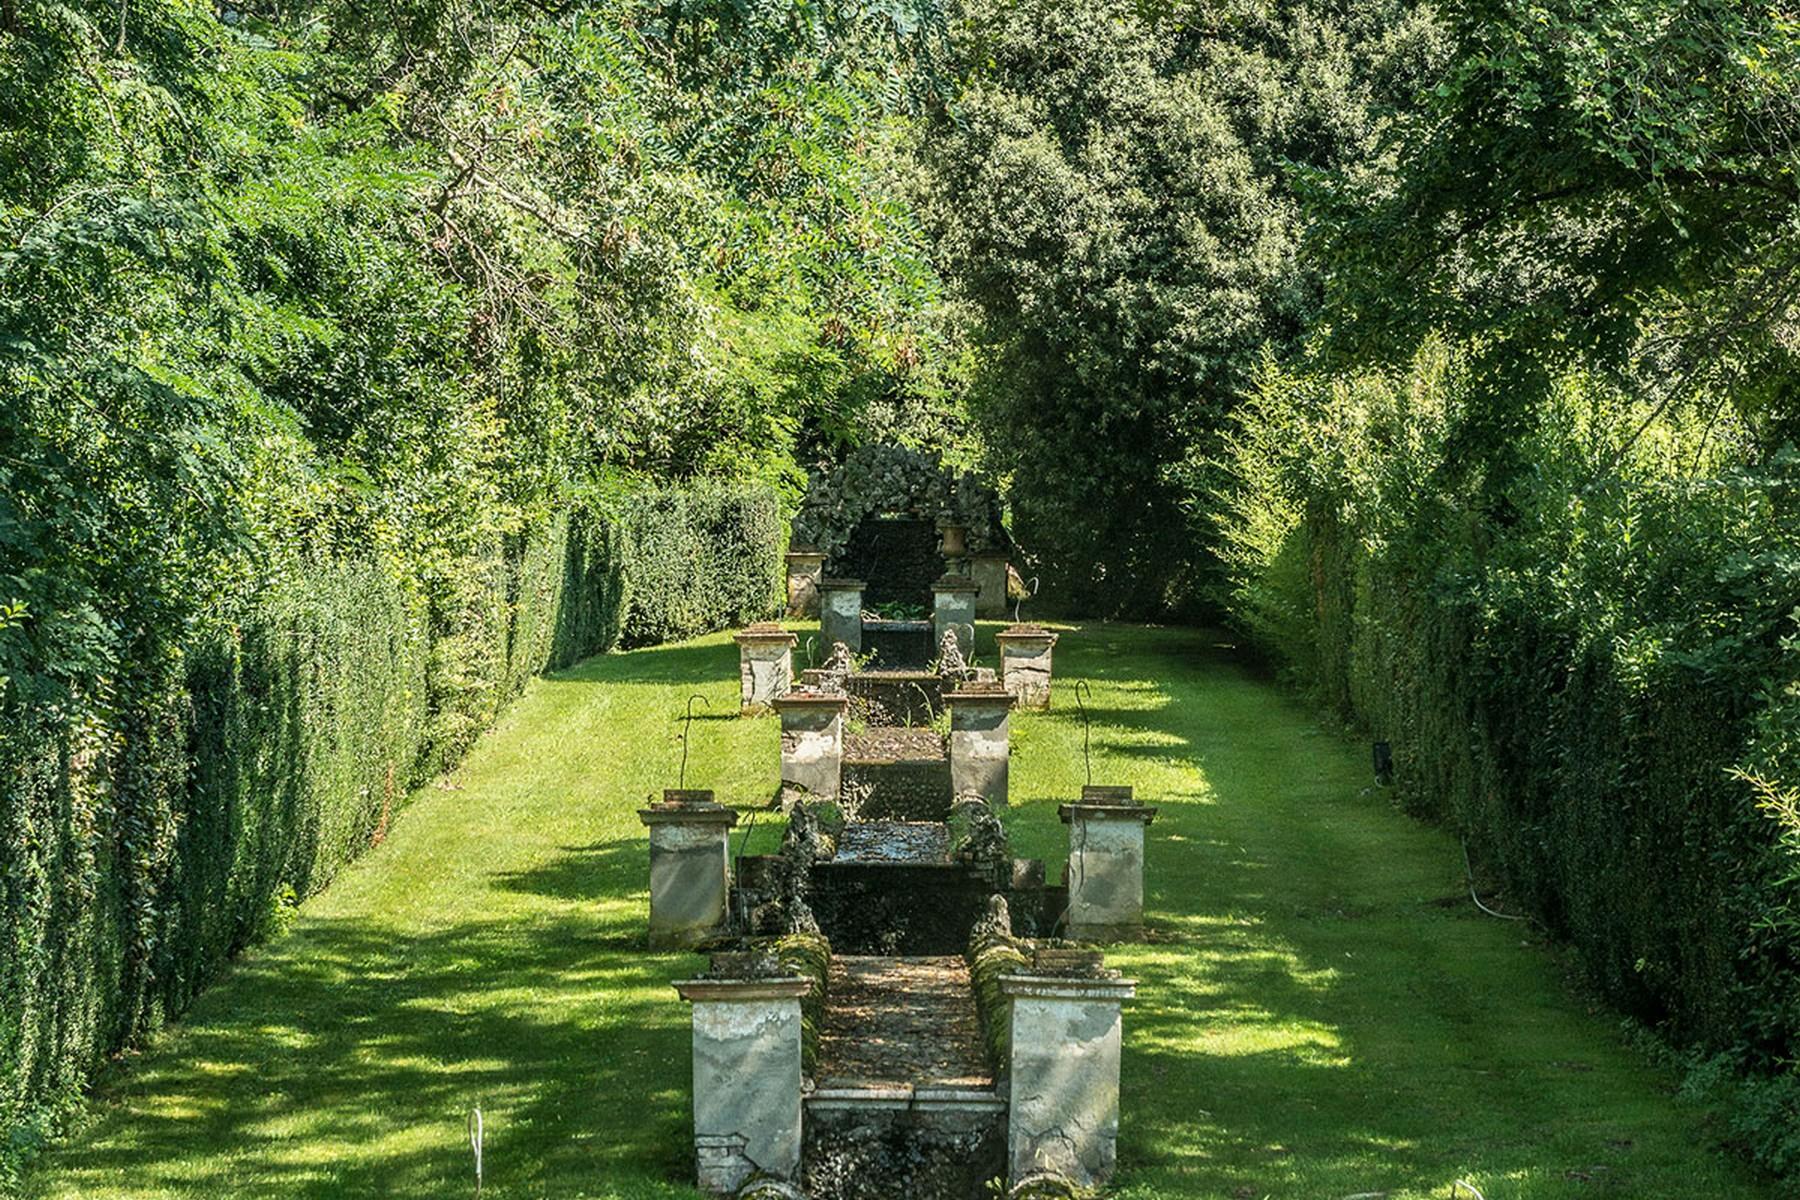 Villa in Vendita a Capannori: 5 locali, 4360 mq - Foto 6